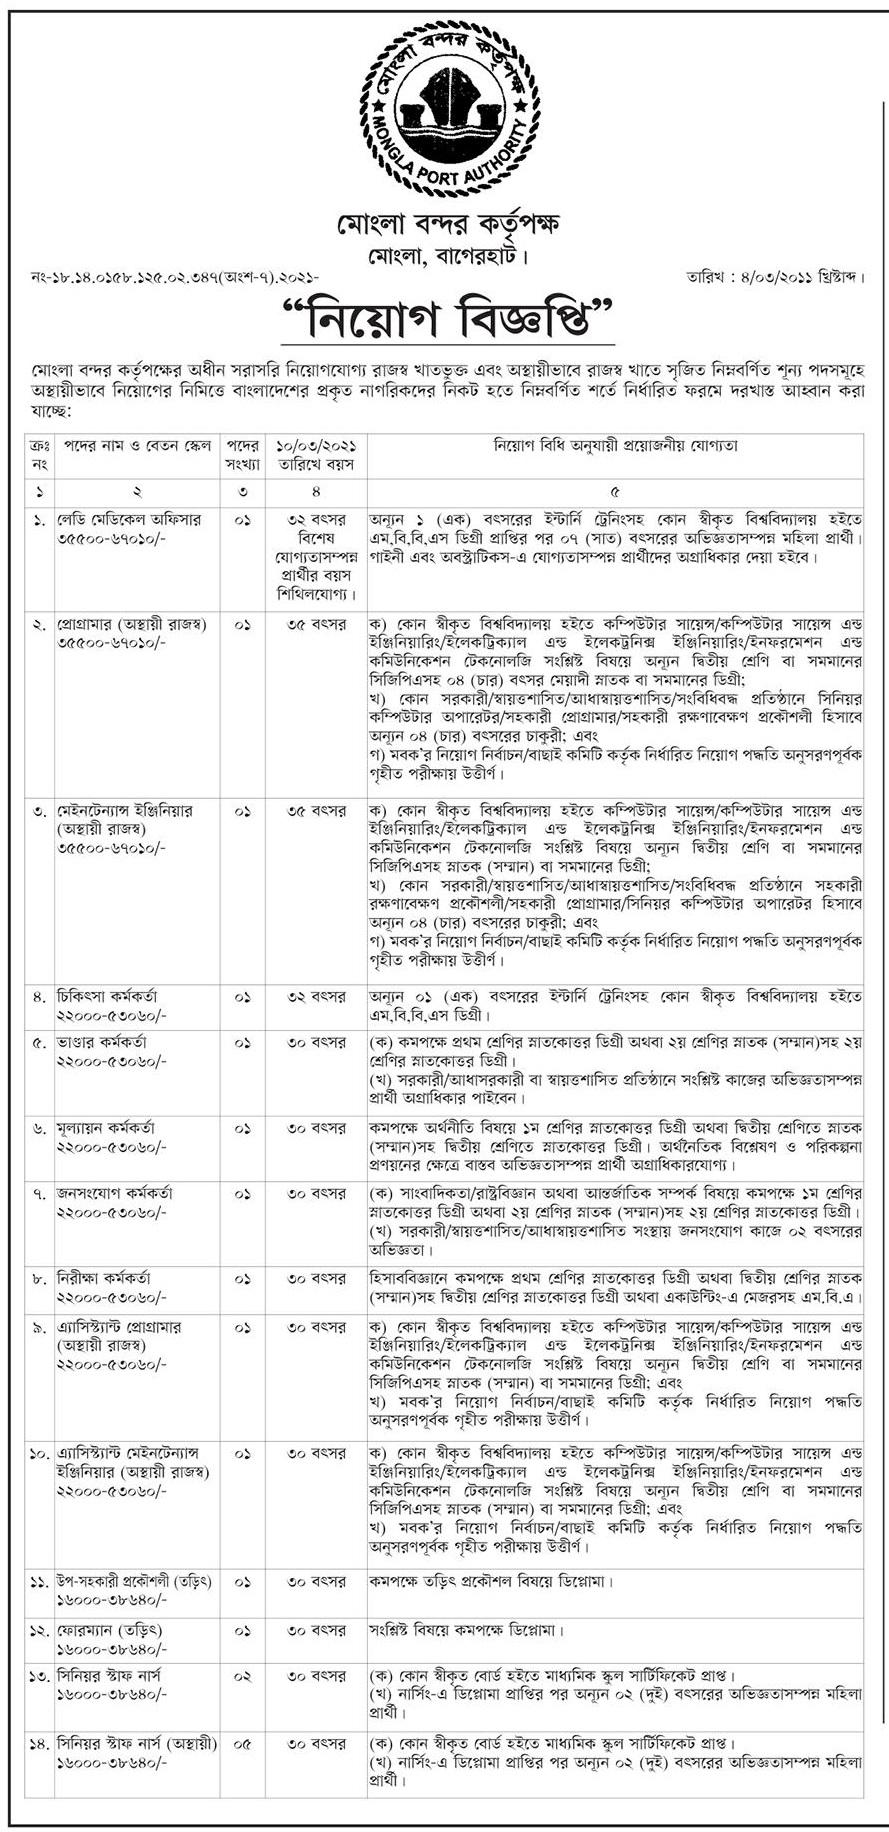 Mongla Port Authority MPA Job Circular 2021 - মোংলা সমুদ্র বন্দর কর্তৃপক্ষ নিয়োগ বিজ্ঞপ্তি ২০২১